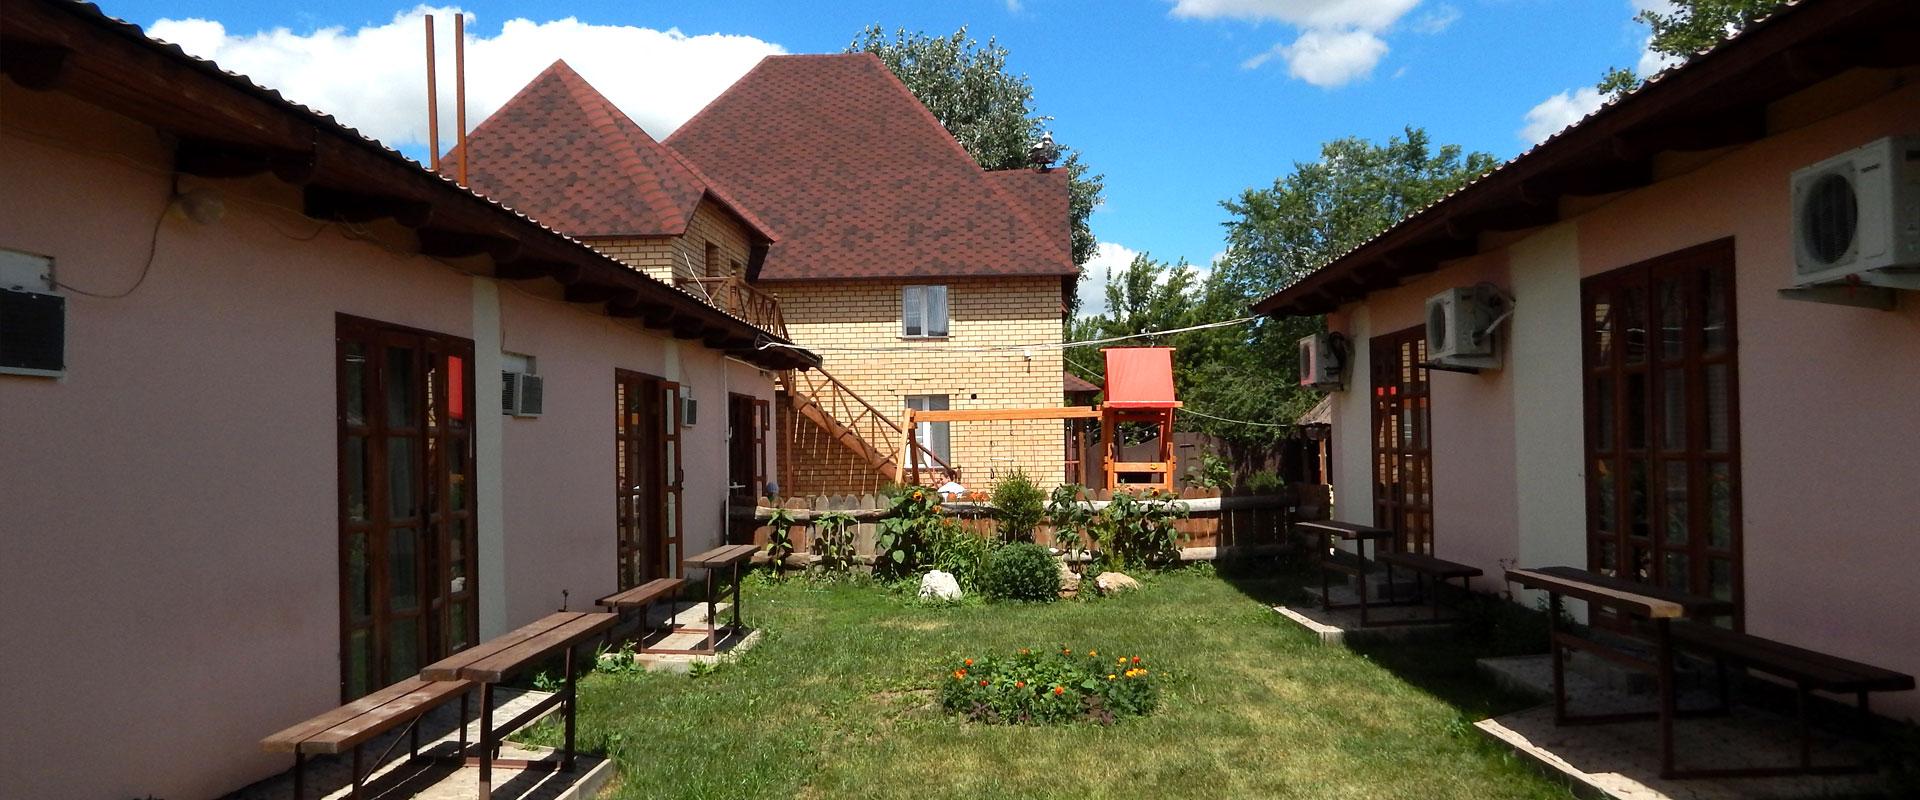 solt-Iletsk hotel atika1